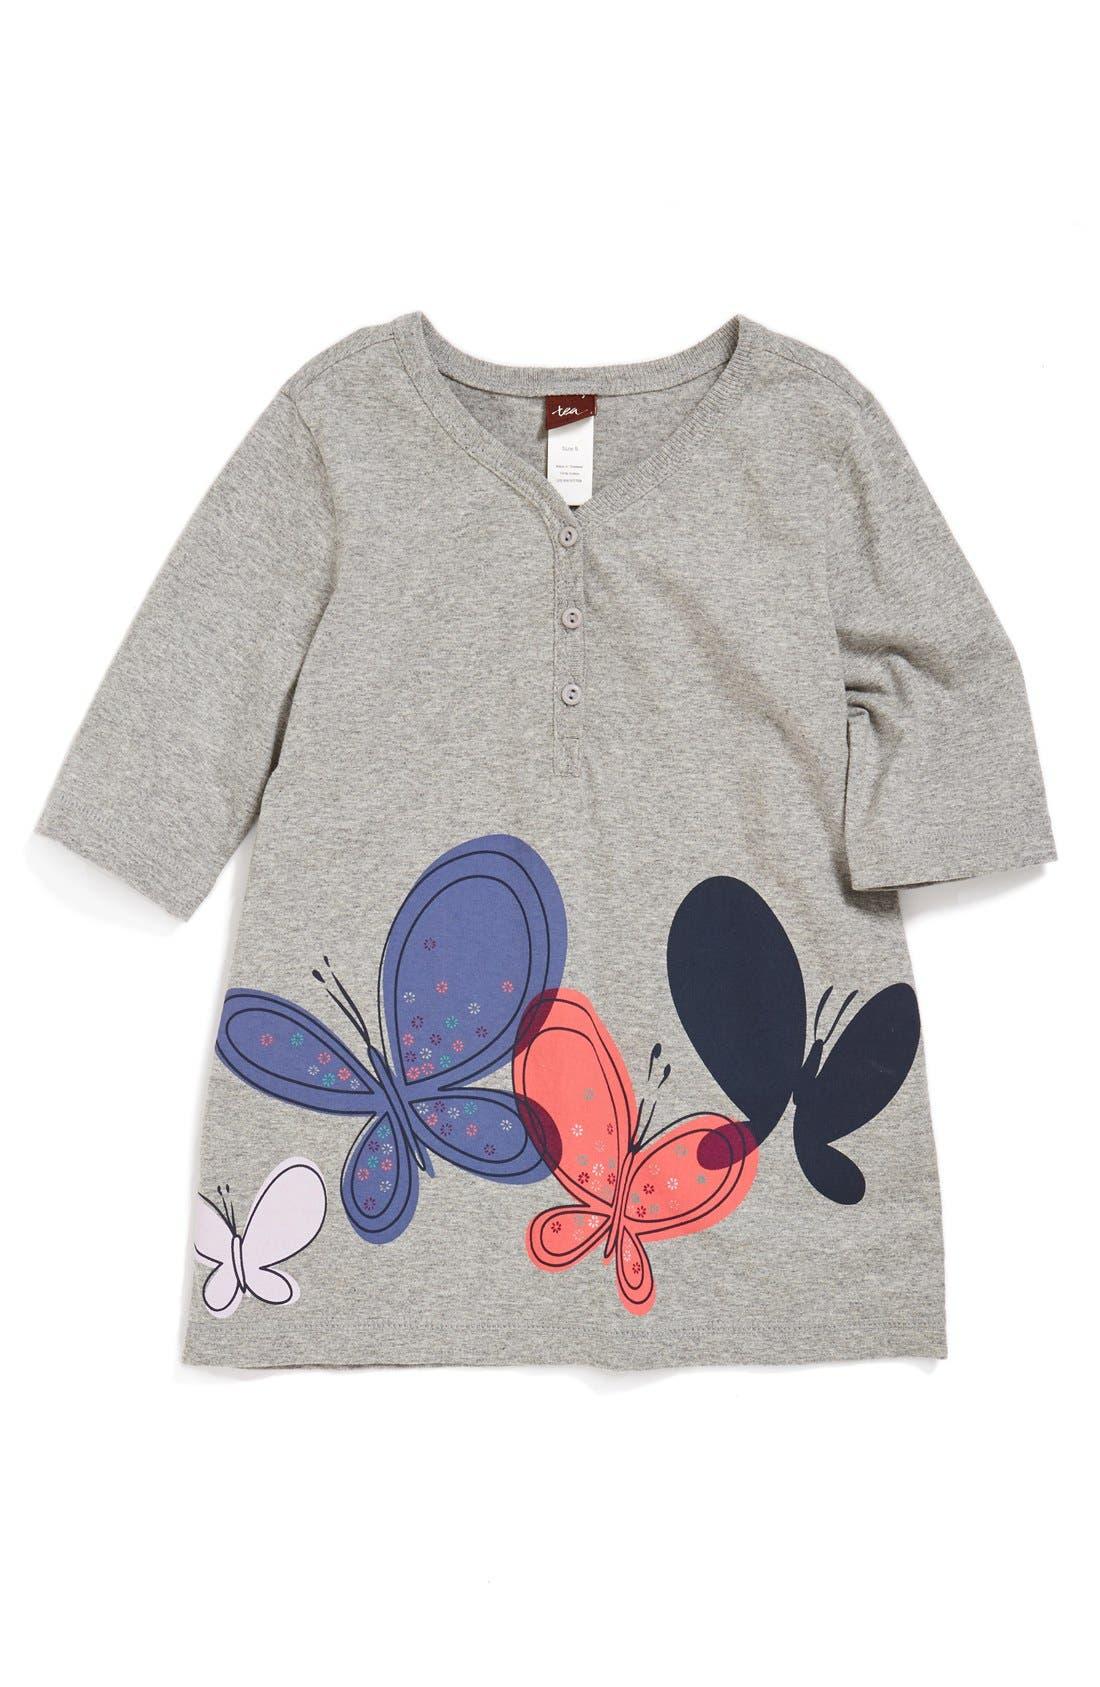 Main Image - Tea Collection 'Schmetterling' Henley Tee (Toddler Girls, Little Girls & Big Girls)